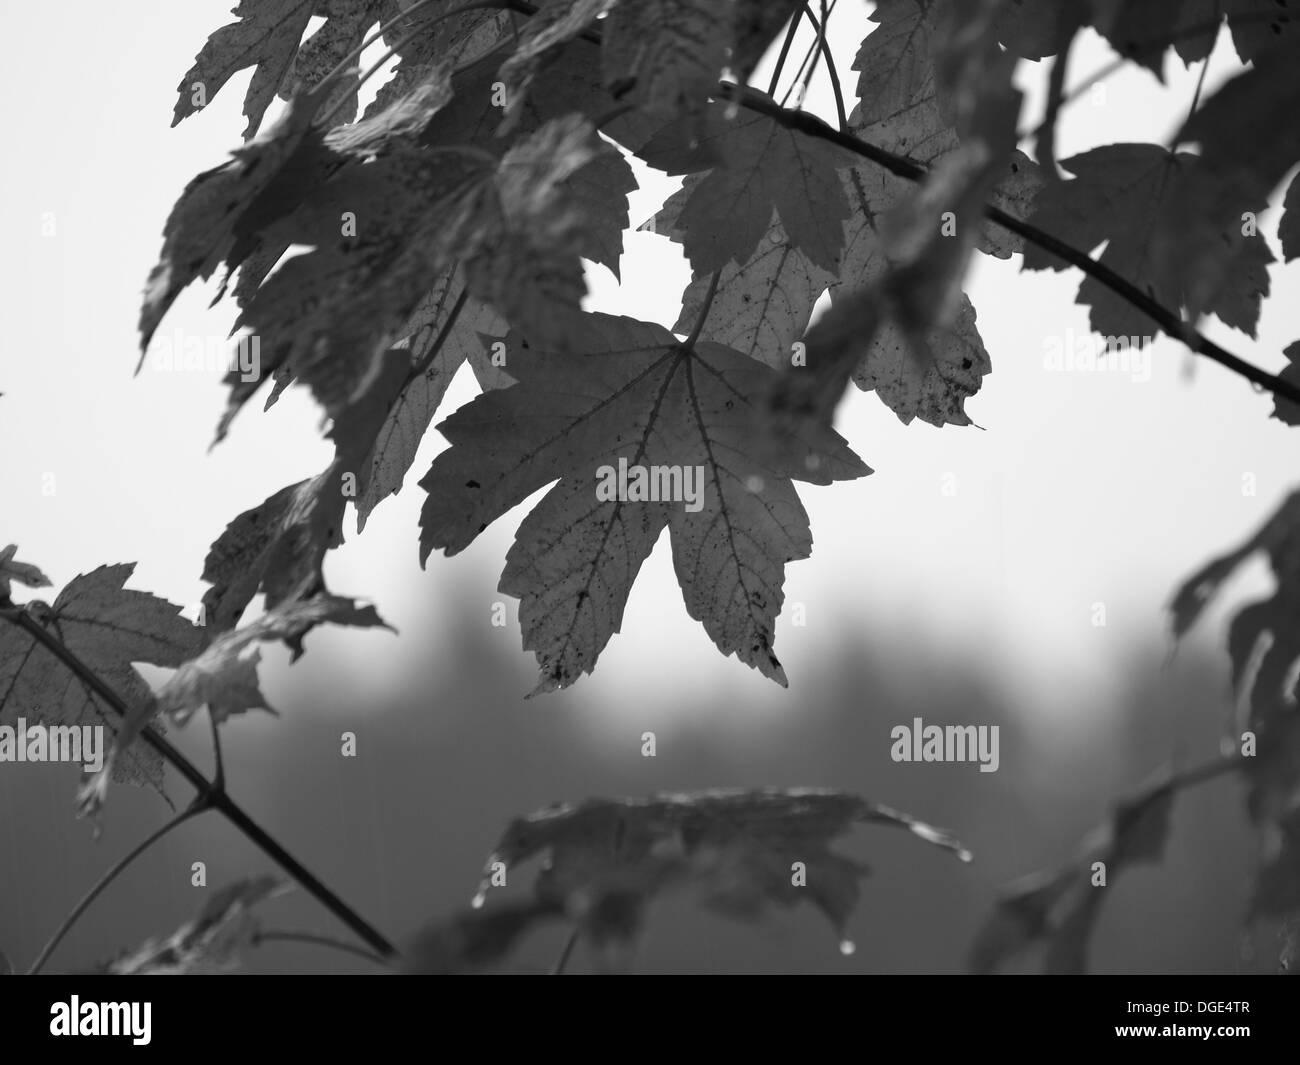 sycamore maple / Acer pseudoplatanus / Bergahorn Stock Photo